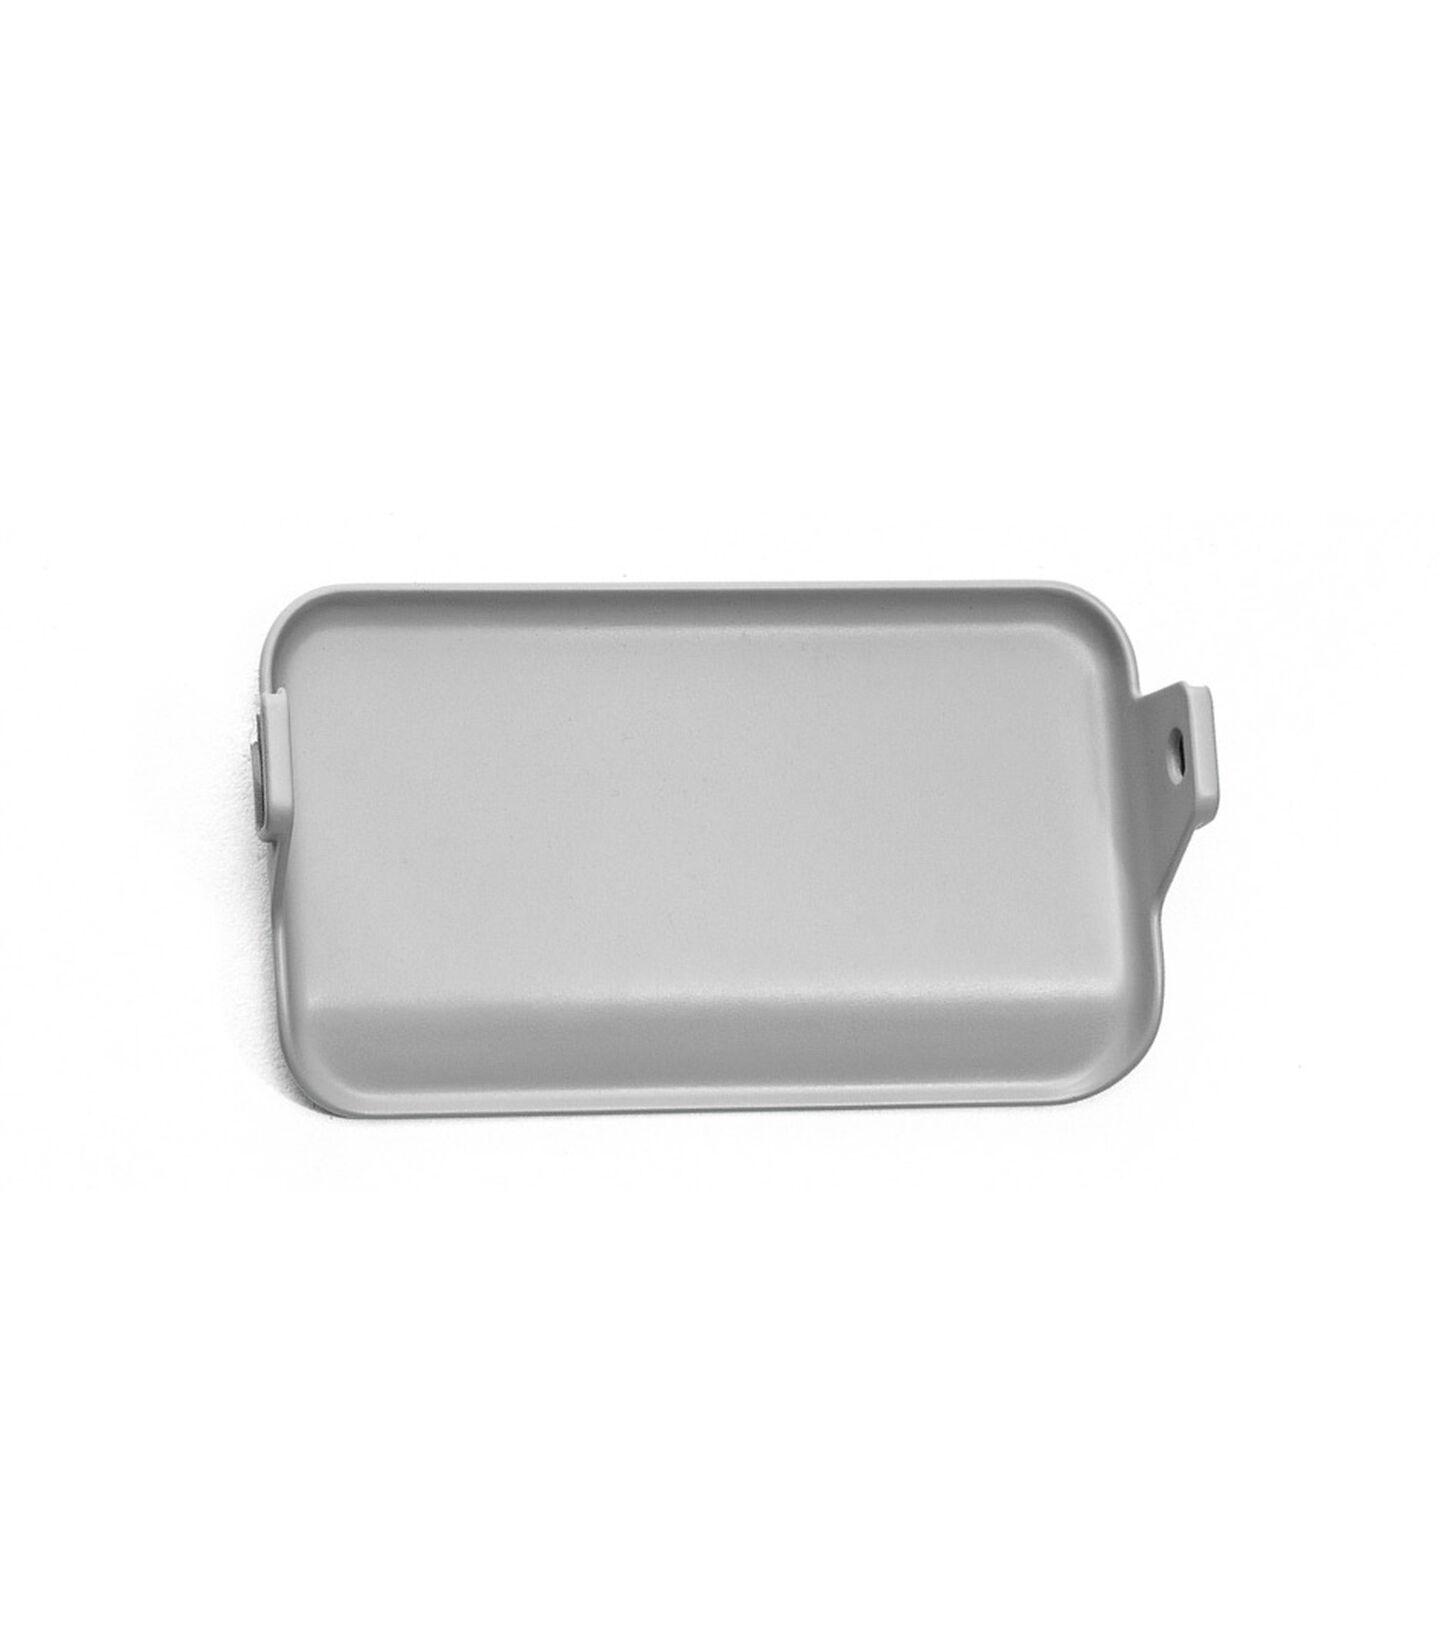 Stokke® Clikk™ Footrest Cloud Grey, Cloud Grey, mainview view 2